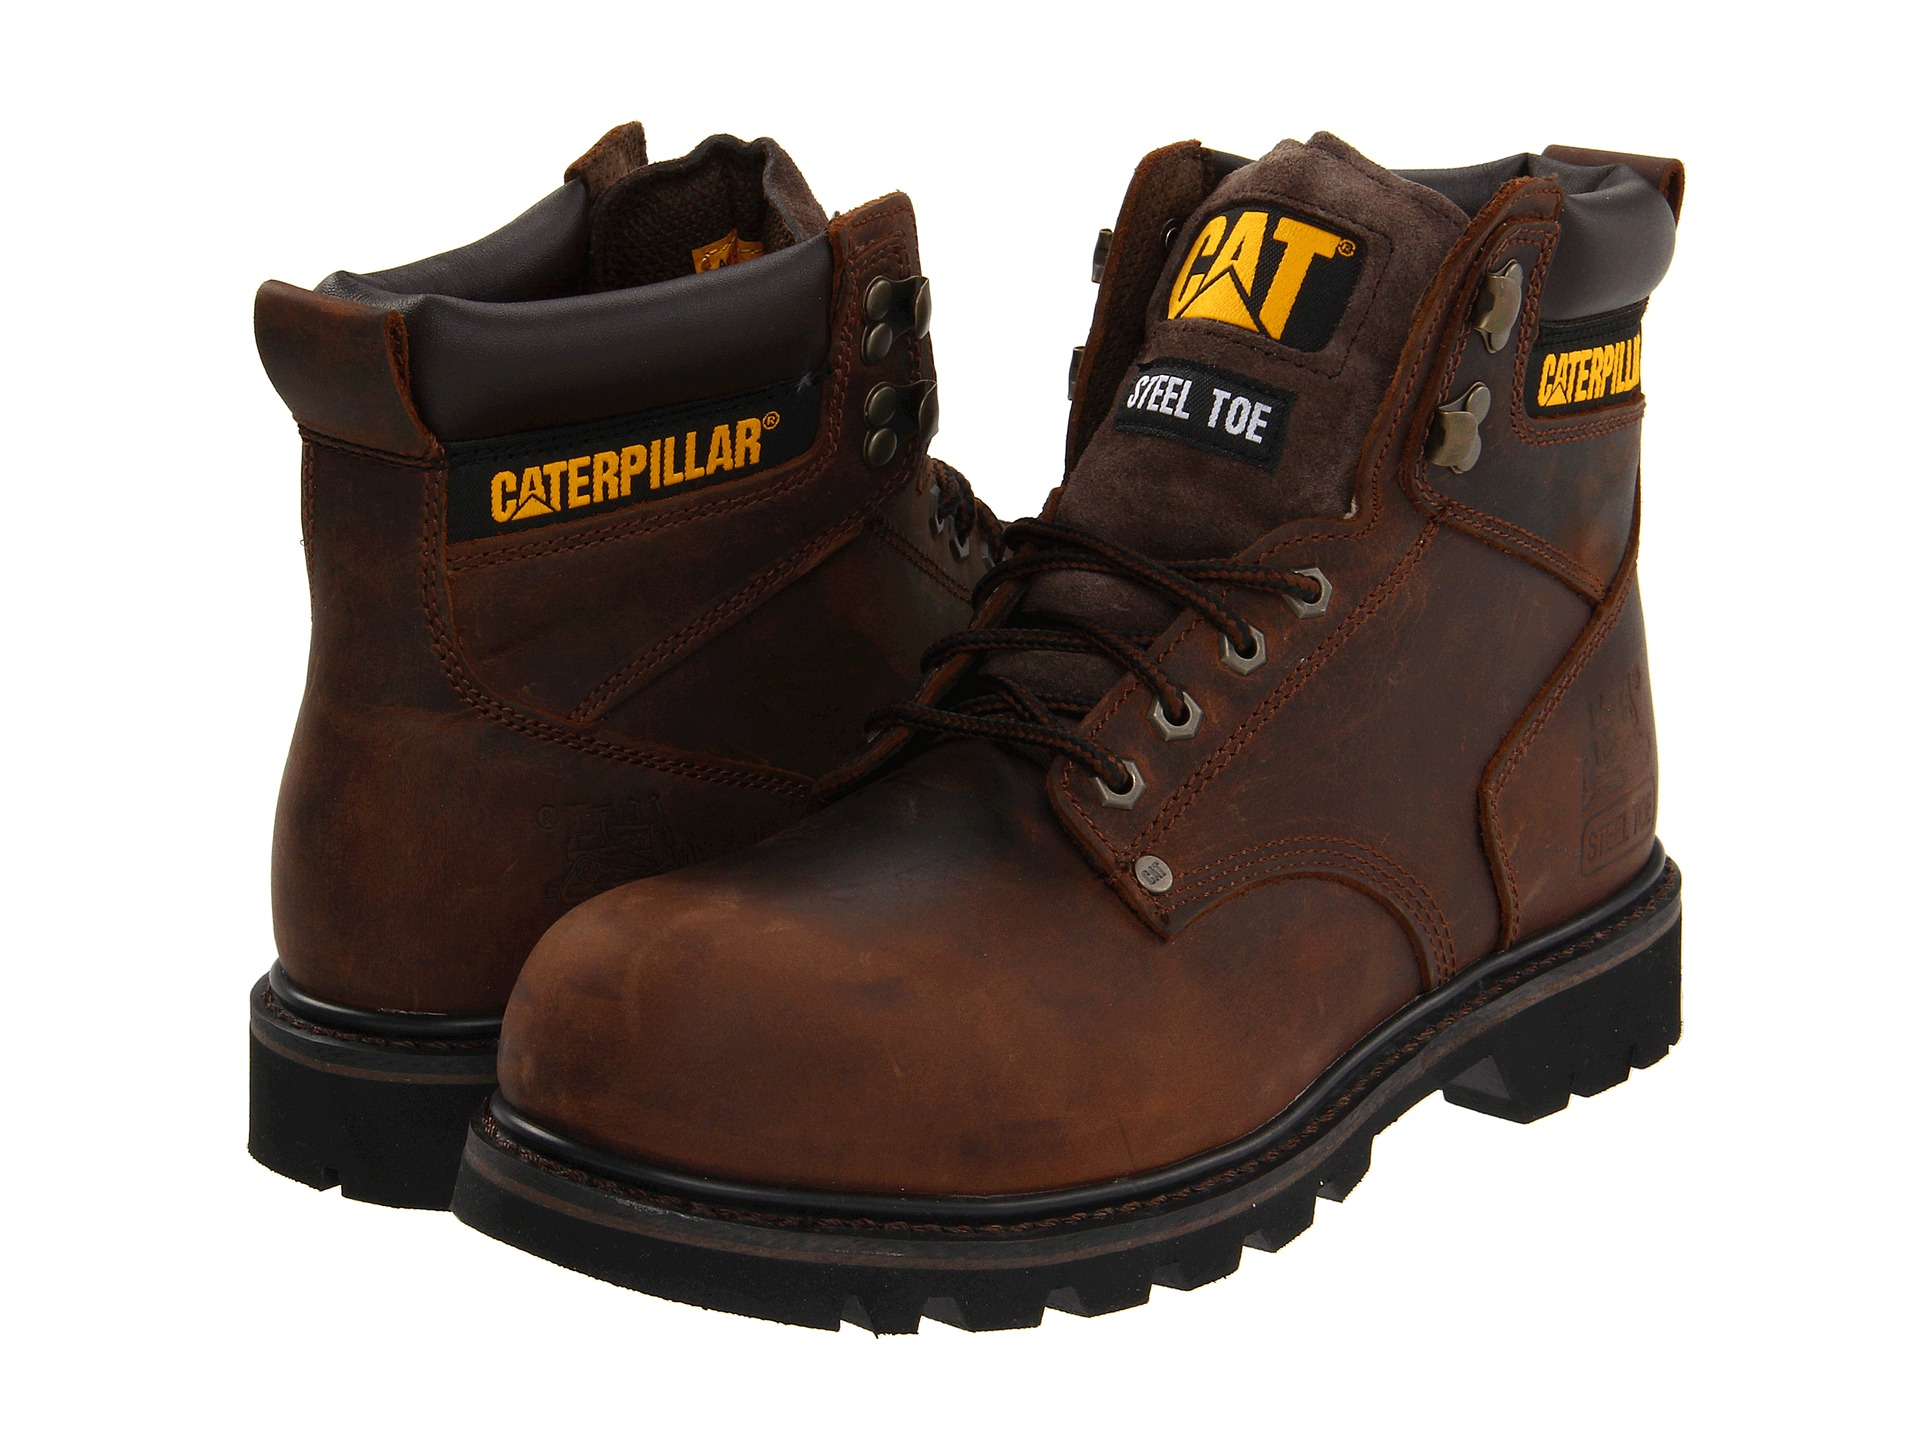 caterpillar nd shift steel toe com shipping both ways